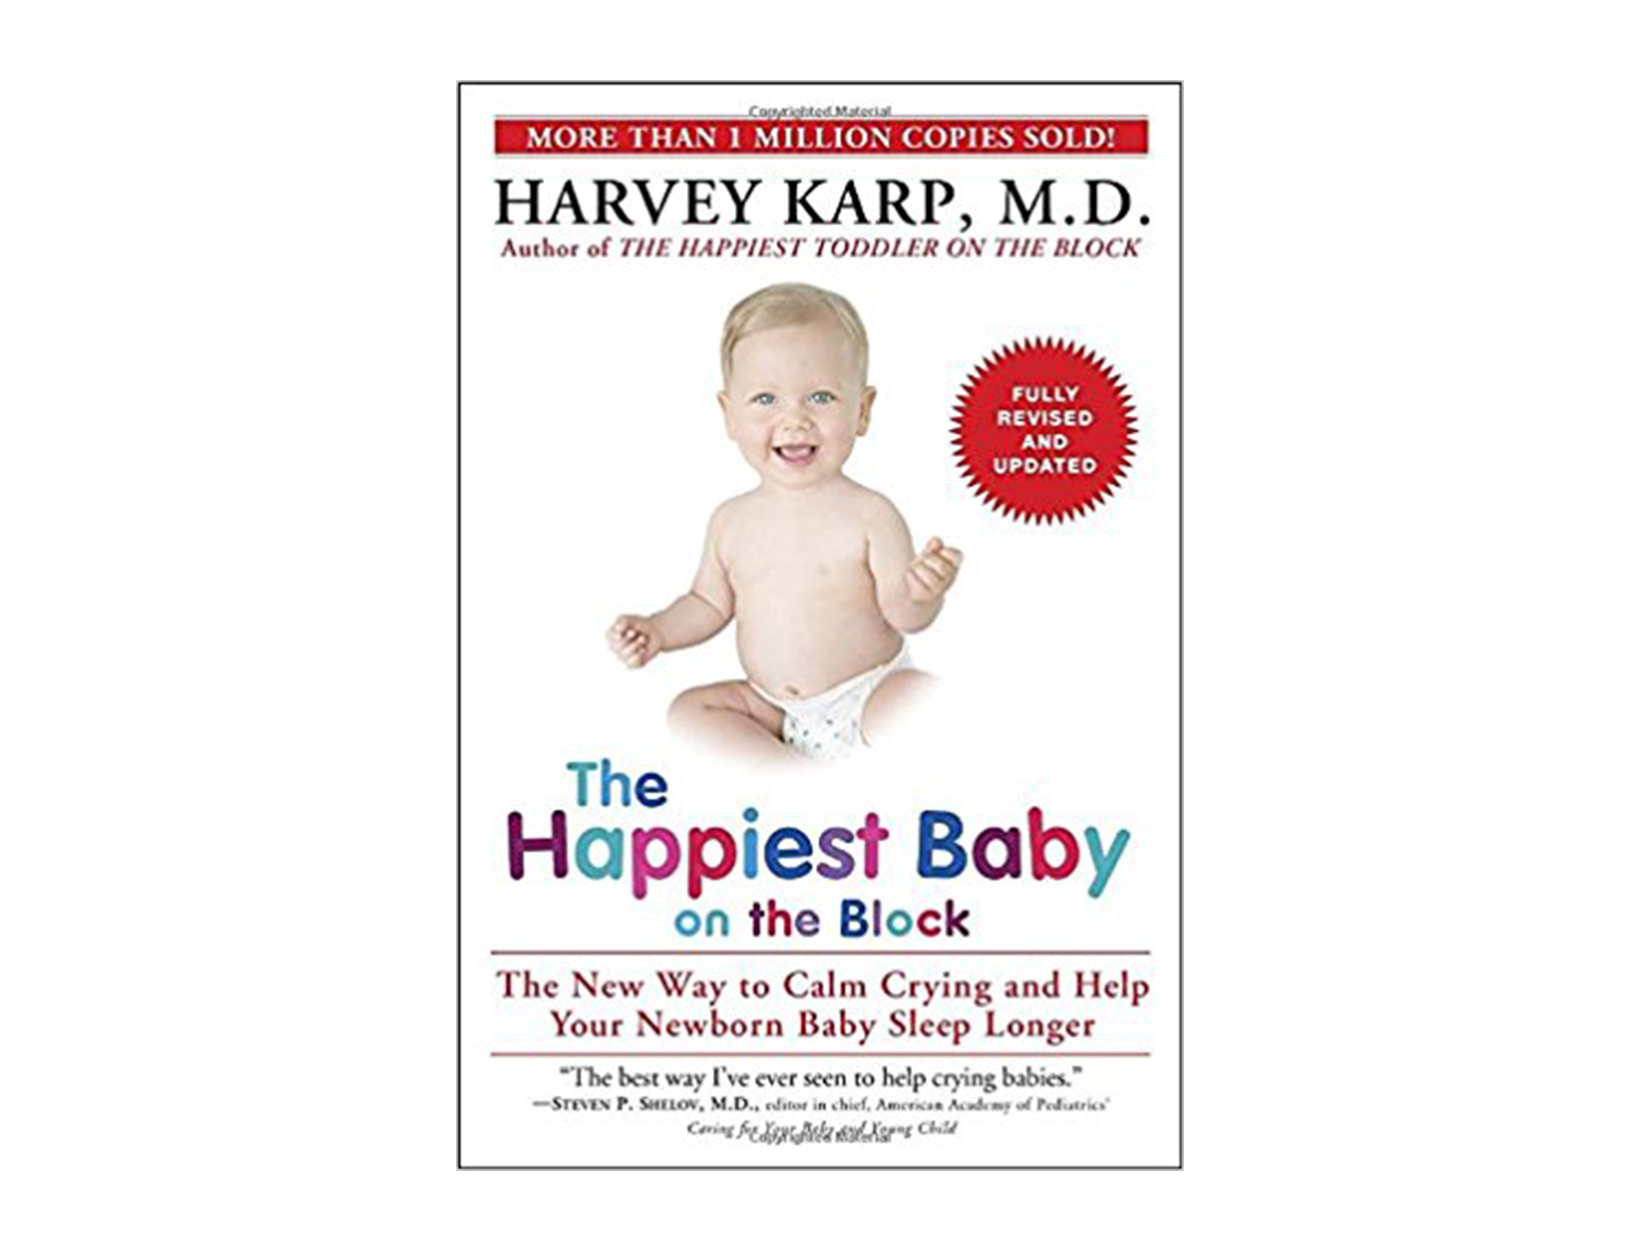 <em>The Happiest Baby on the Block</em> by Harvey Karp